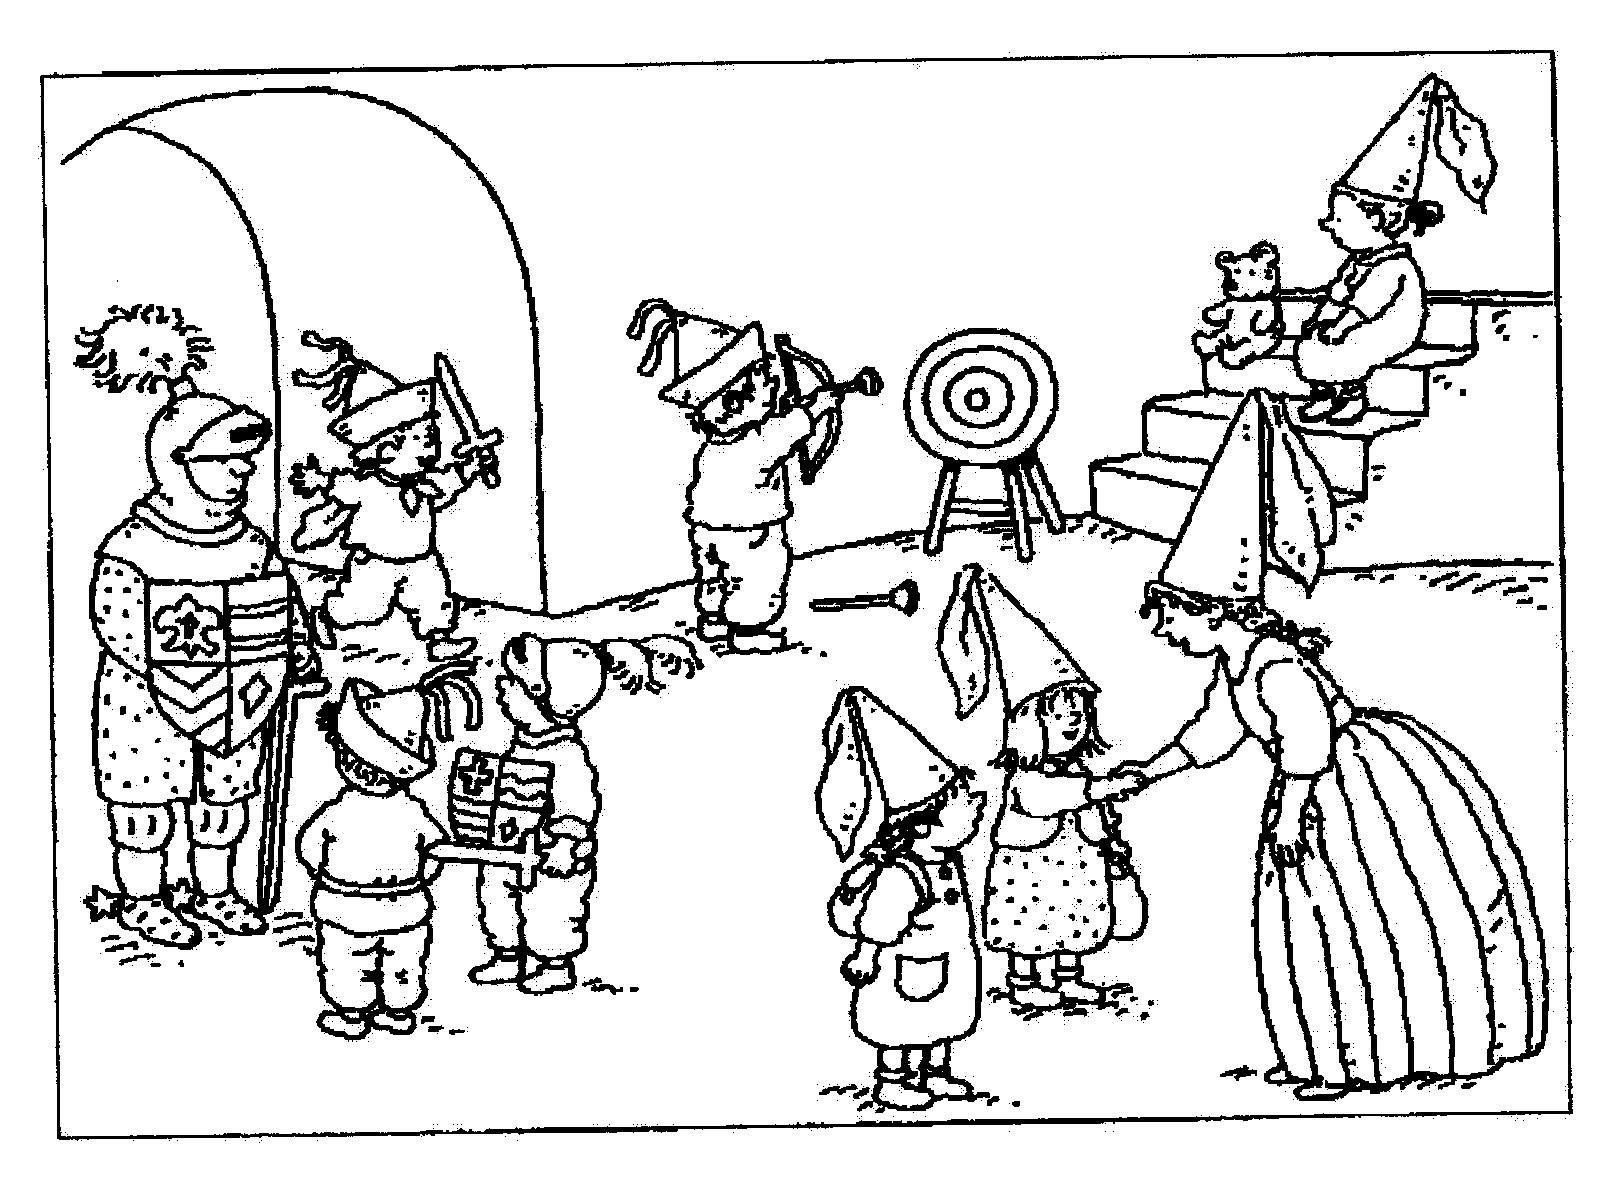 Kleurplaat middeleeuwen pinterest ridder for Werkbladen ridders en kastelen